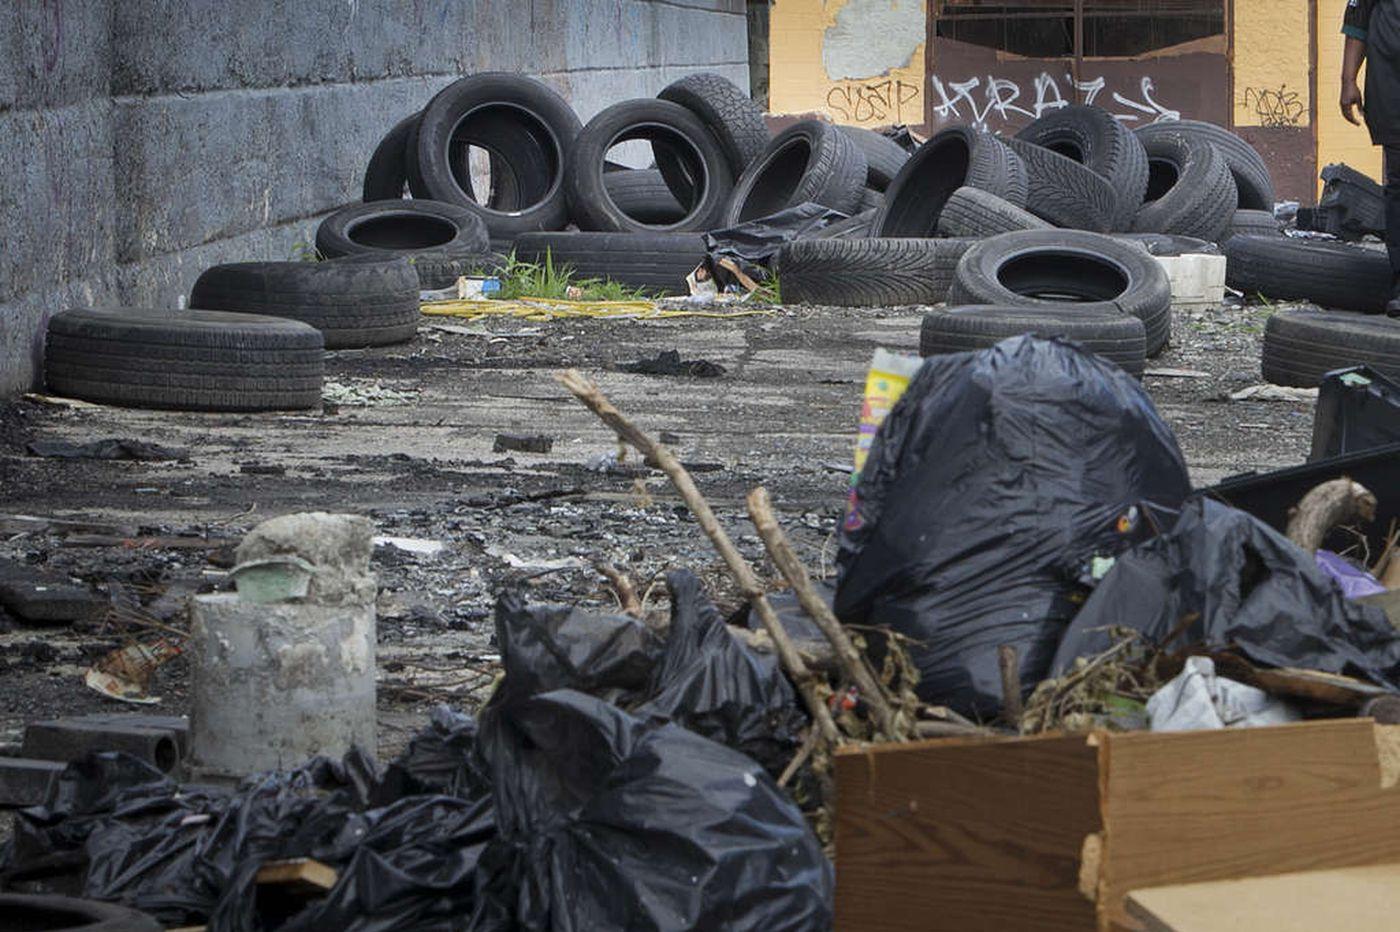 Philadelphia plans to install 100 surveillance cameras to nab illegal dumpers